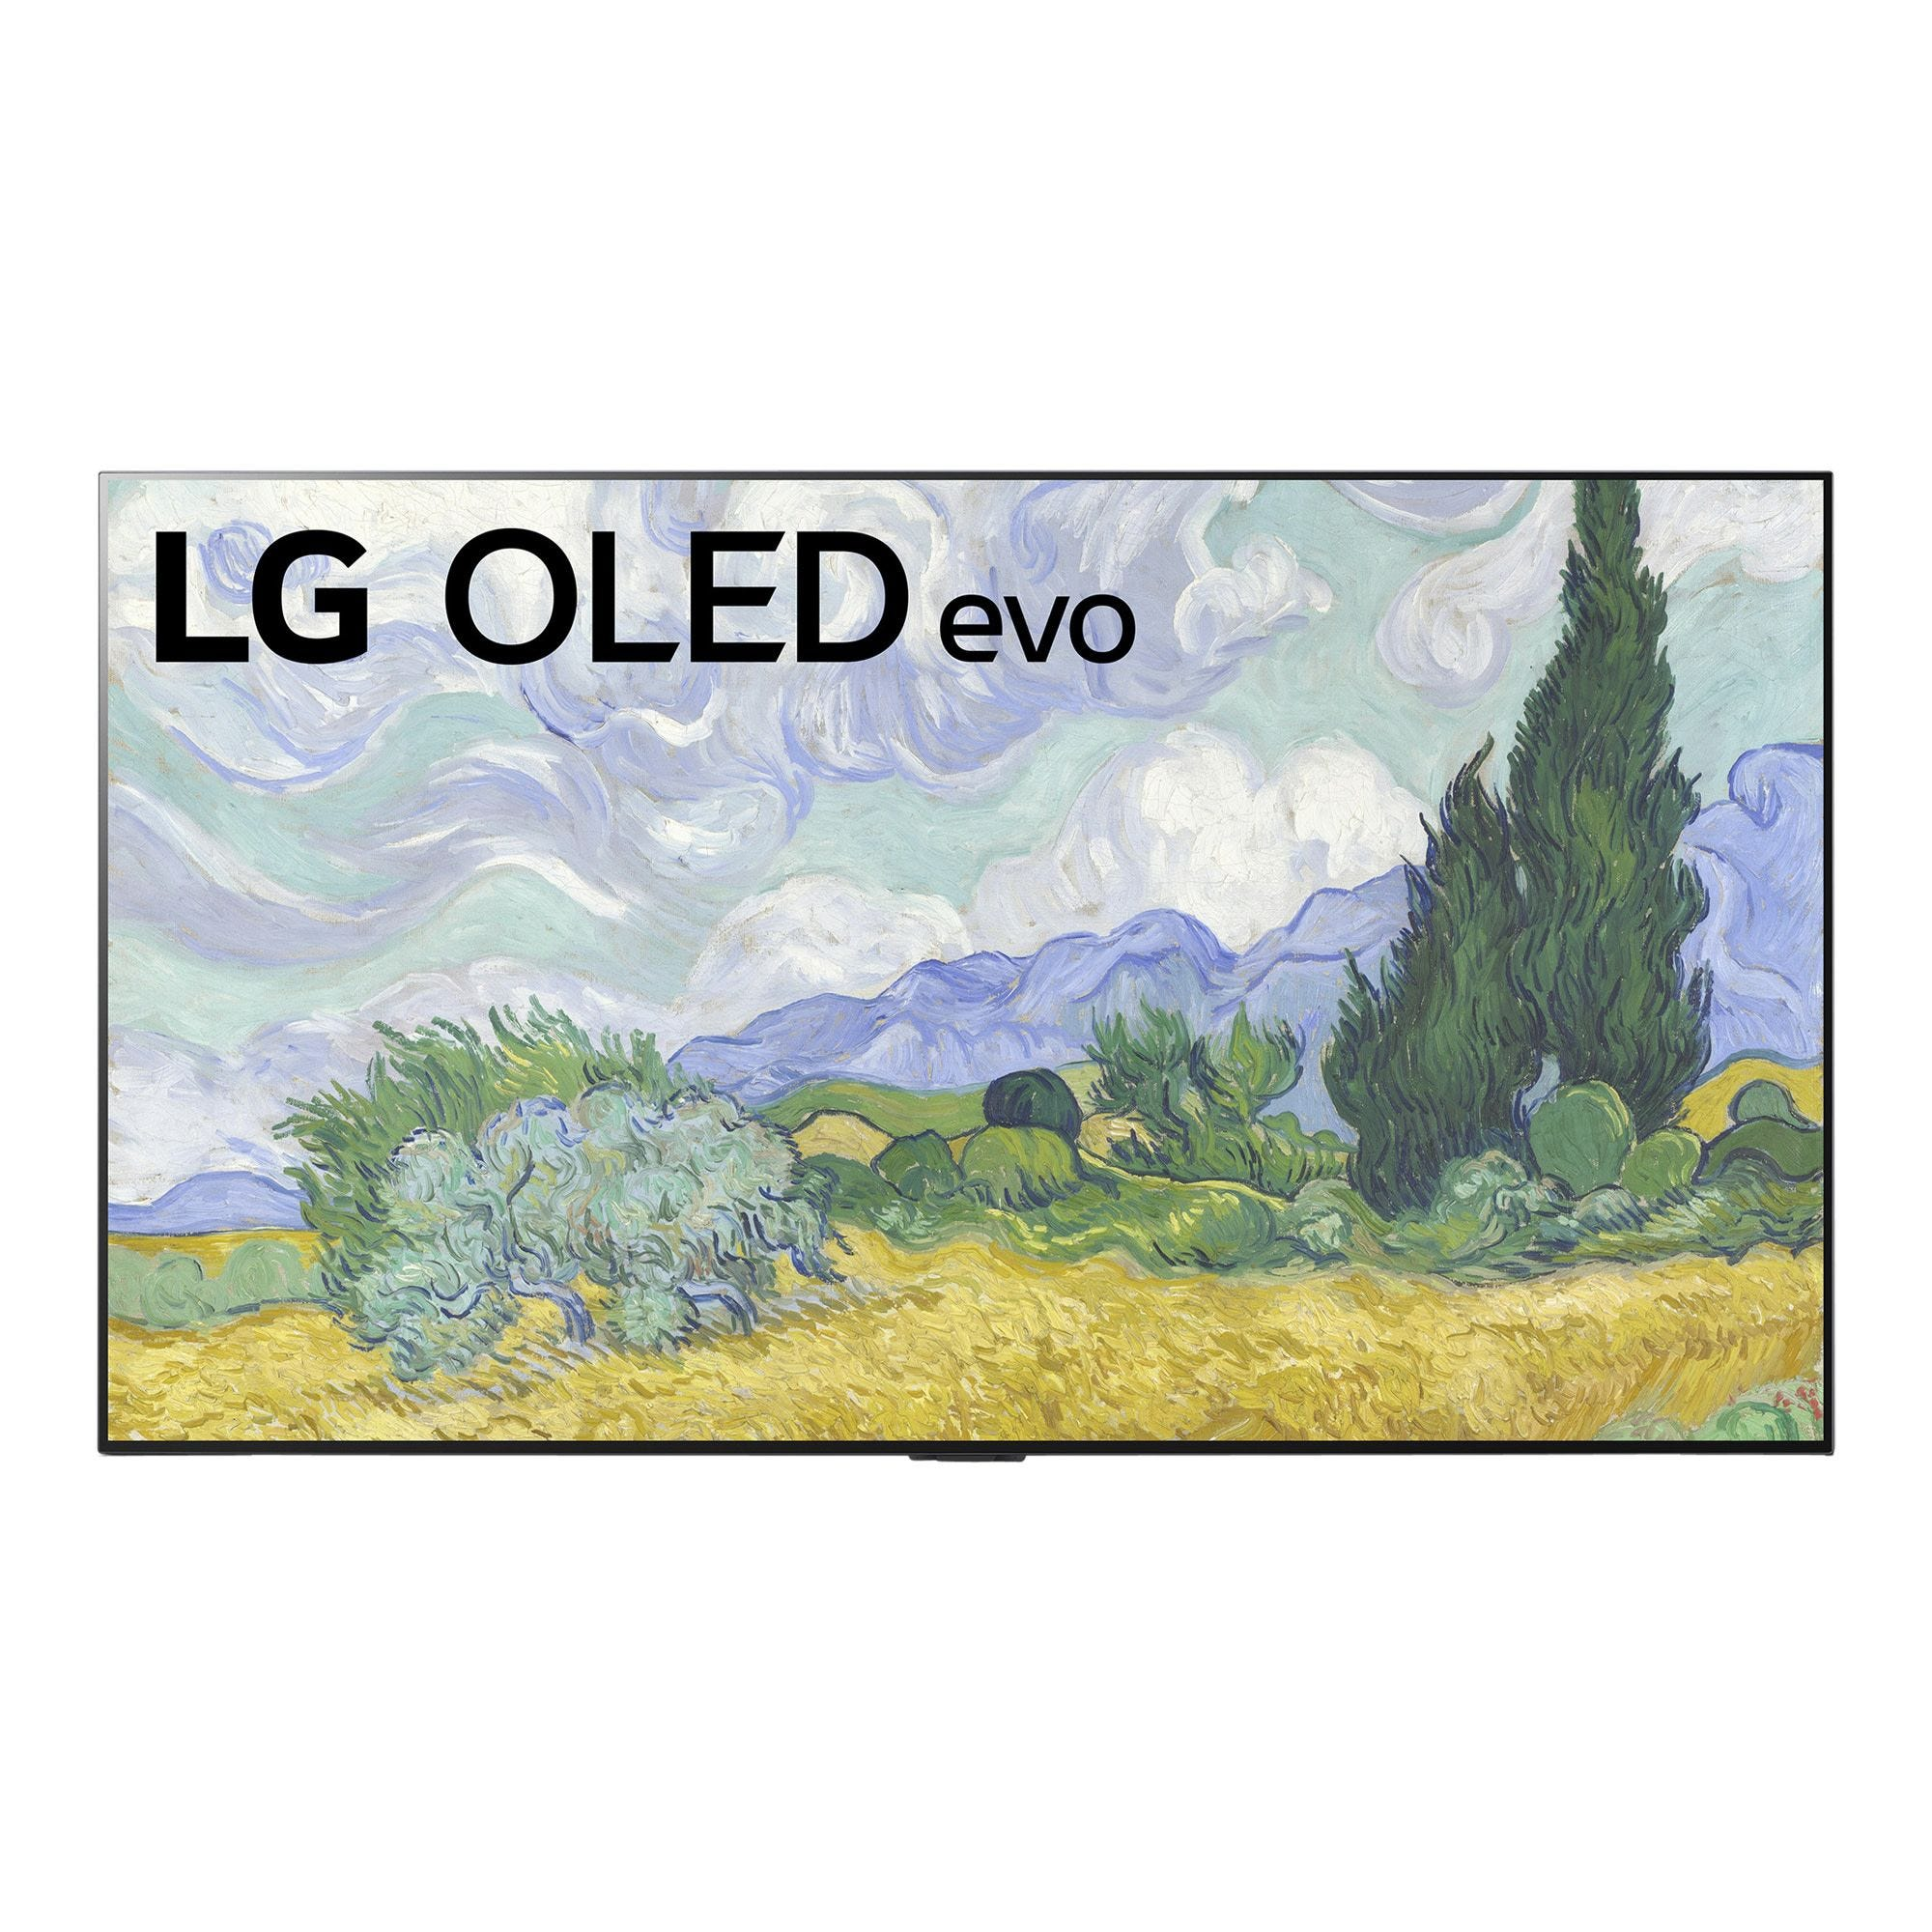 LG G1 OLED TV